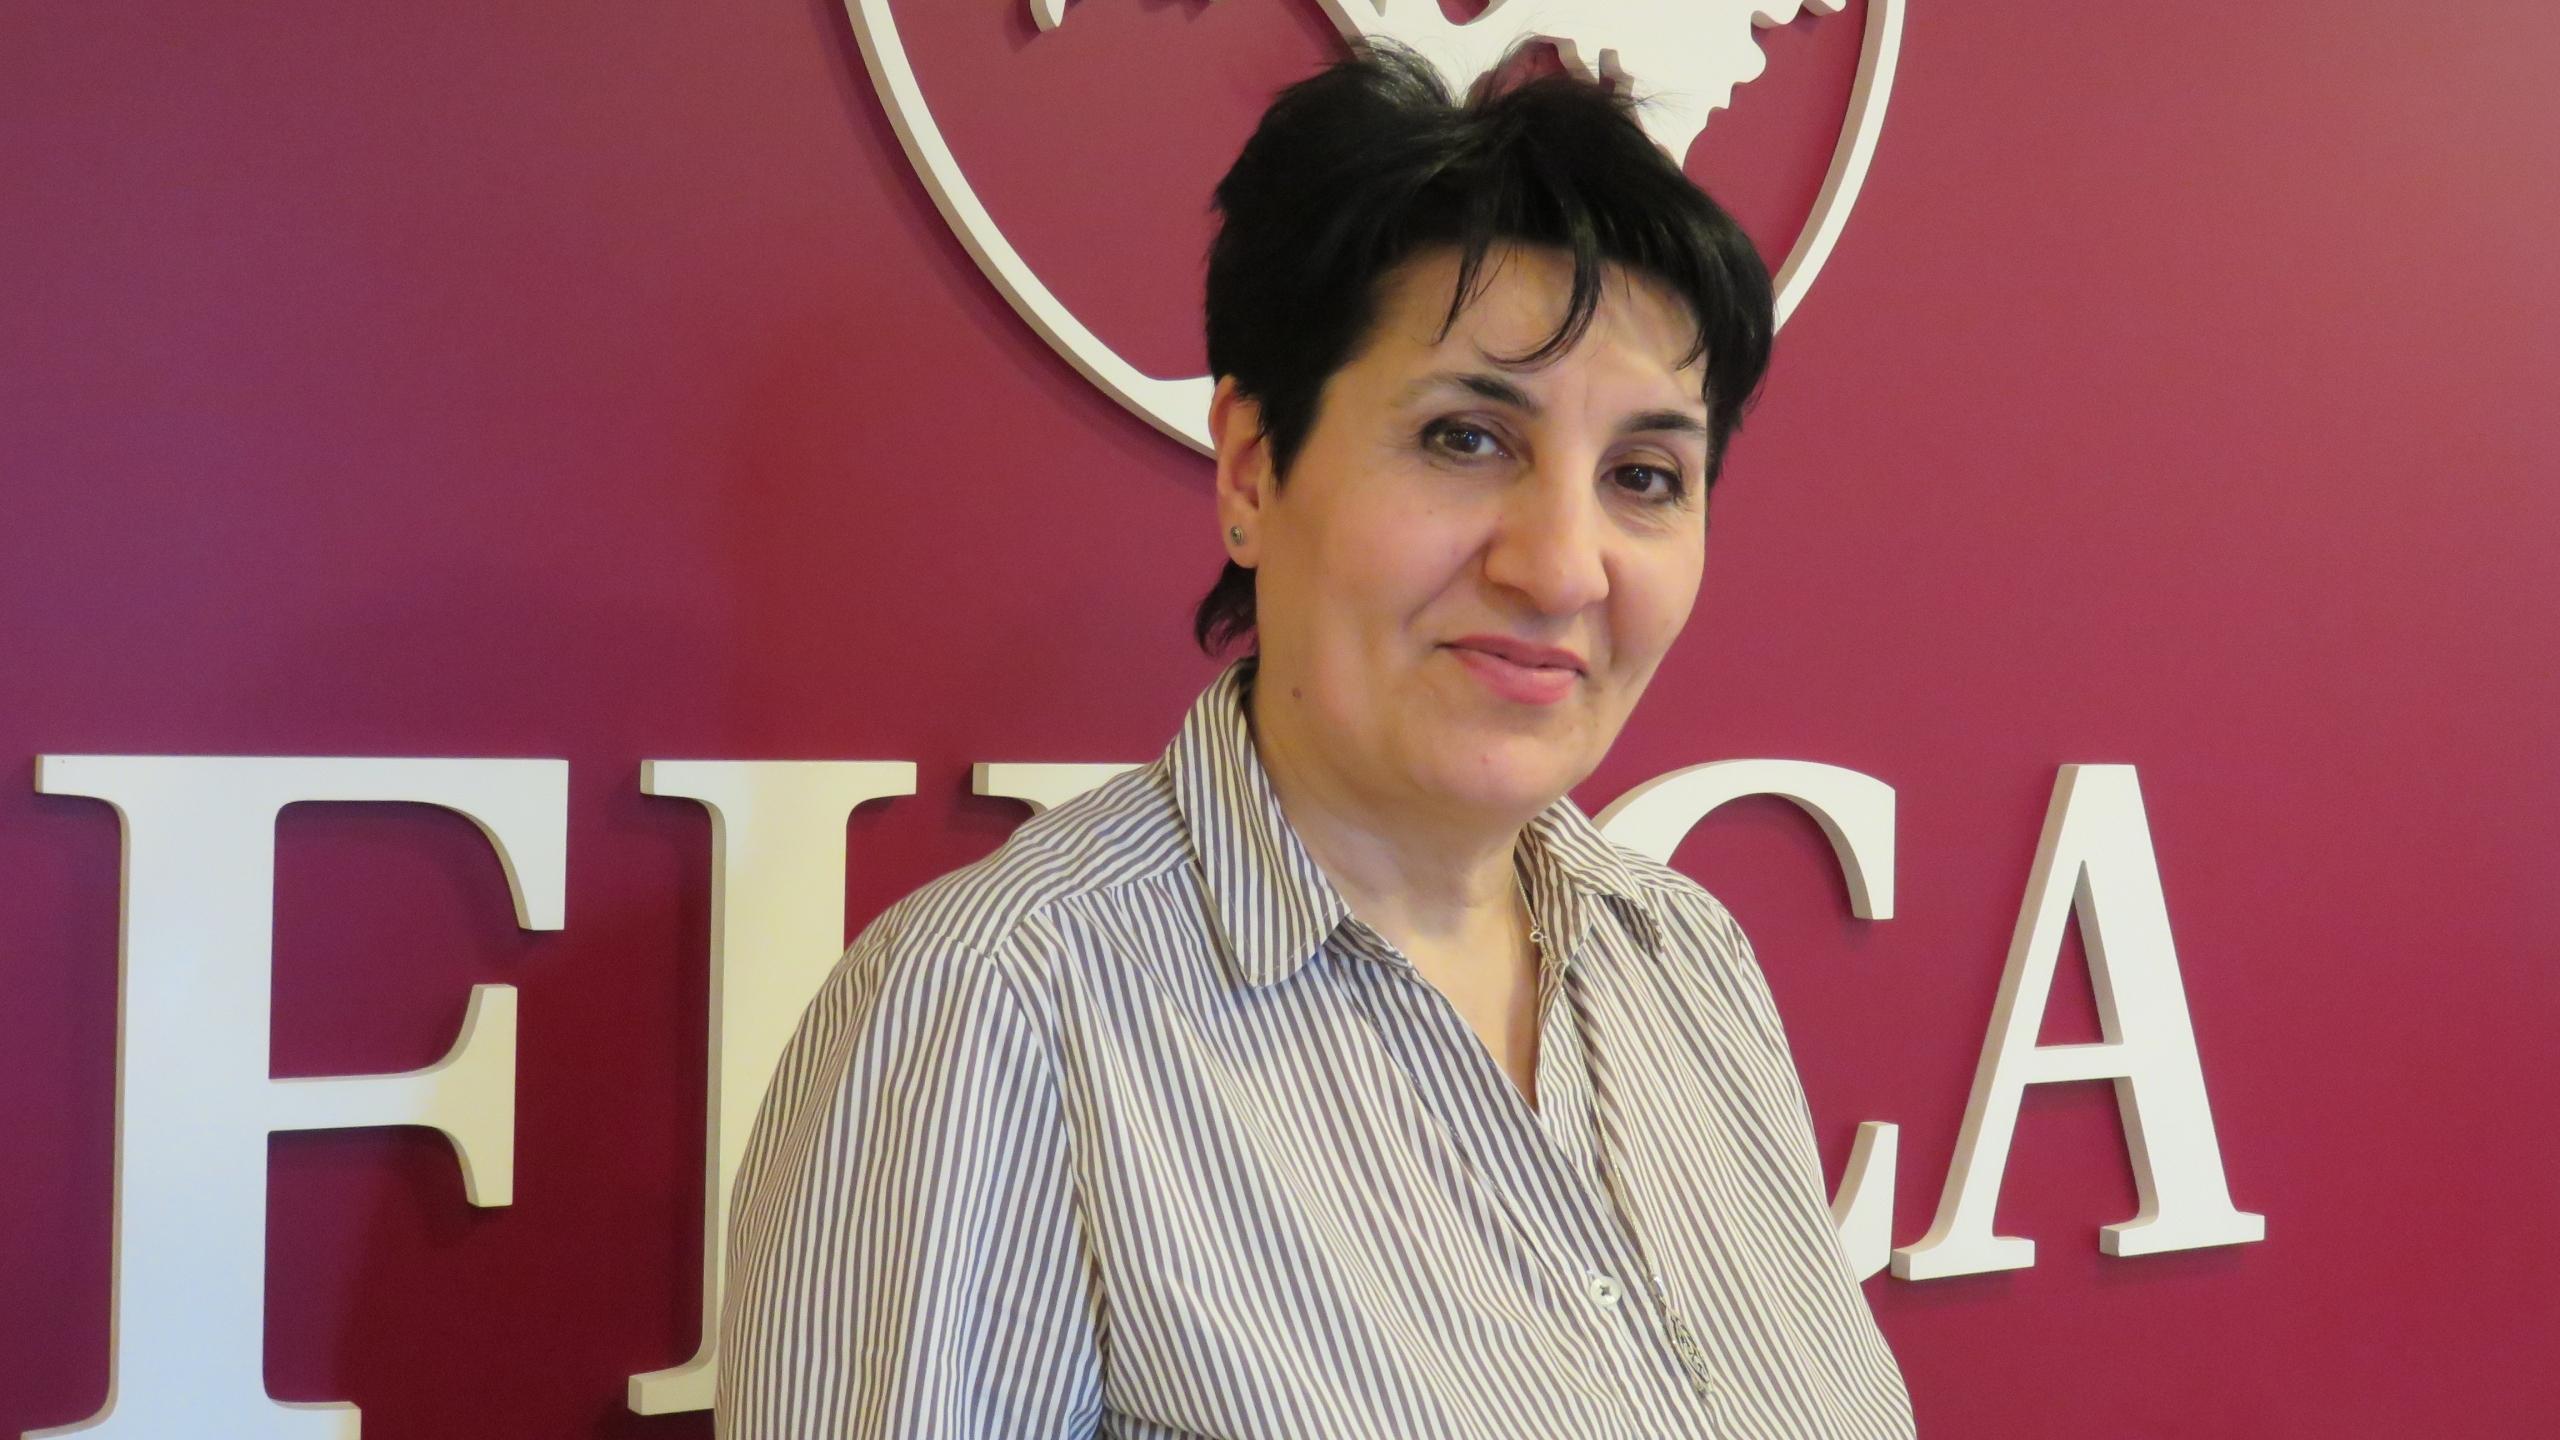 Susanna Melkoumyan